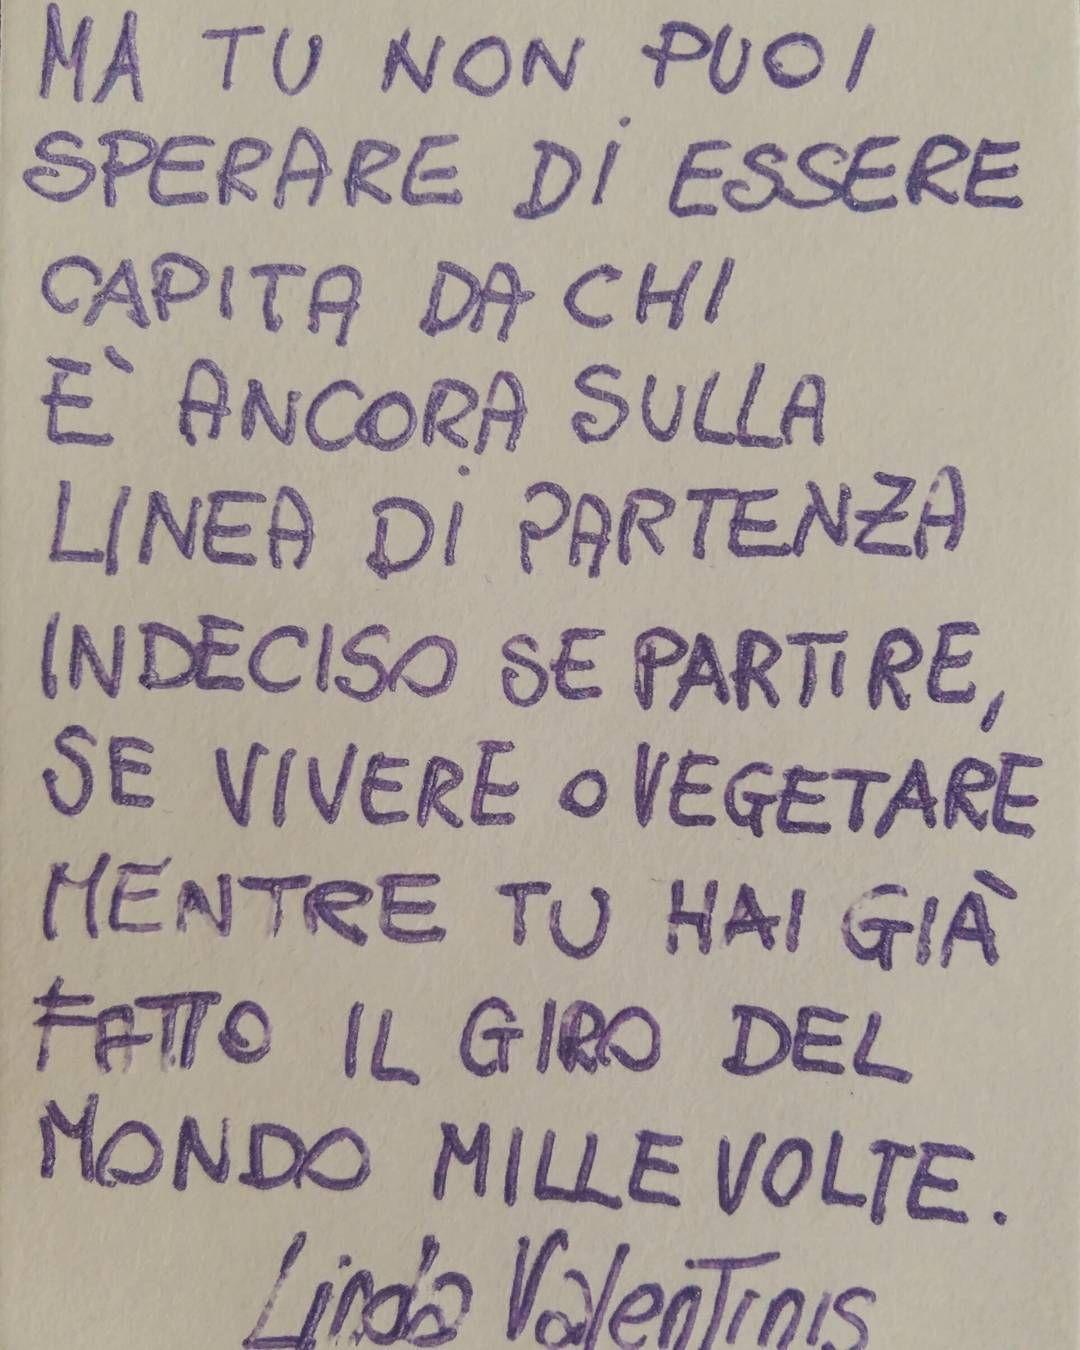 Citazioni Frasi Aforismi Linda Valentinis Candele